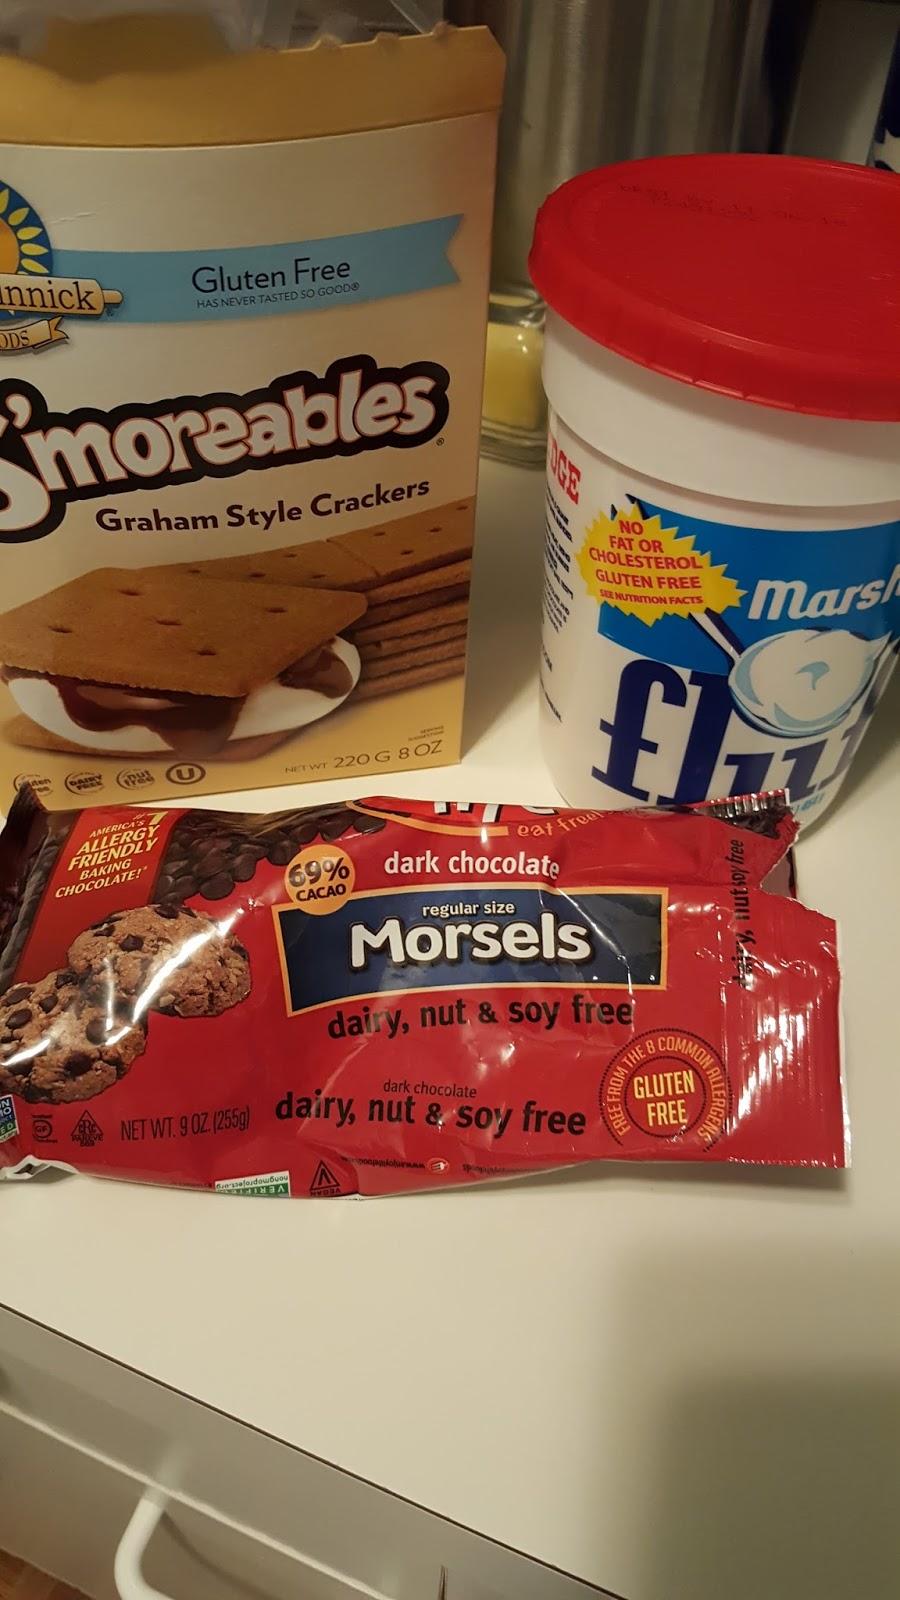 Recipe: America's Test Kitchen, Chocolate Fluff Cookies